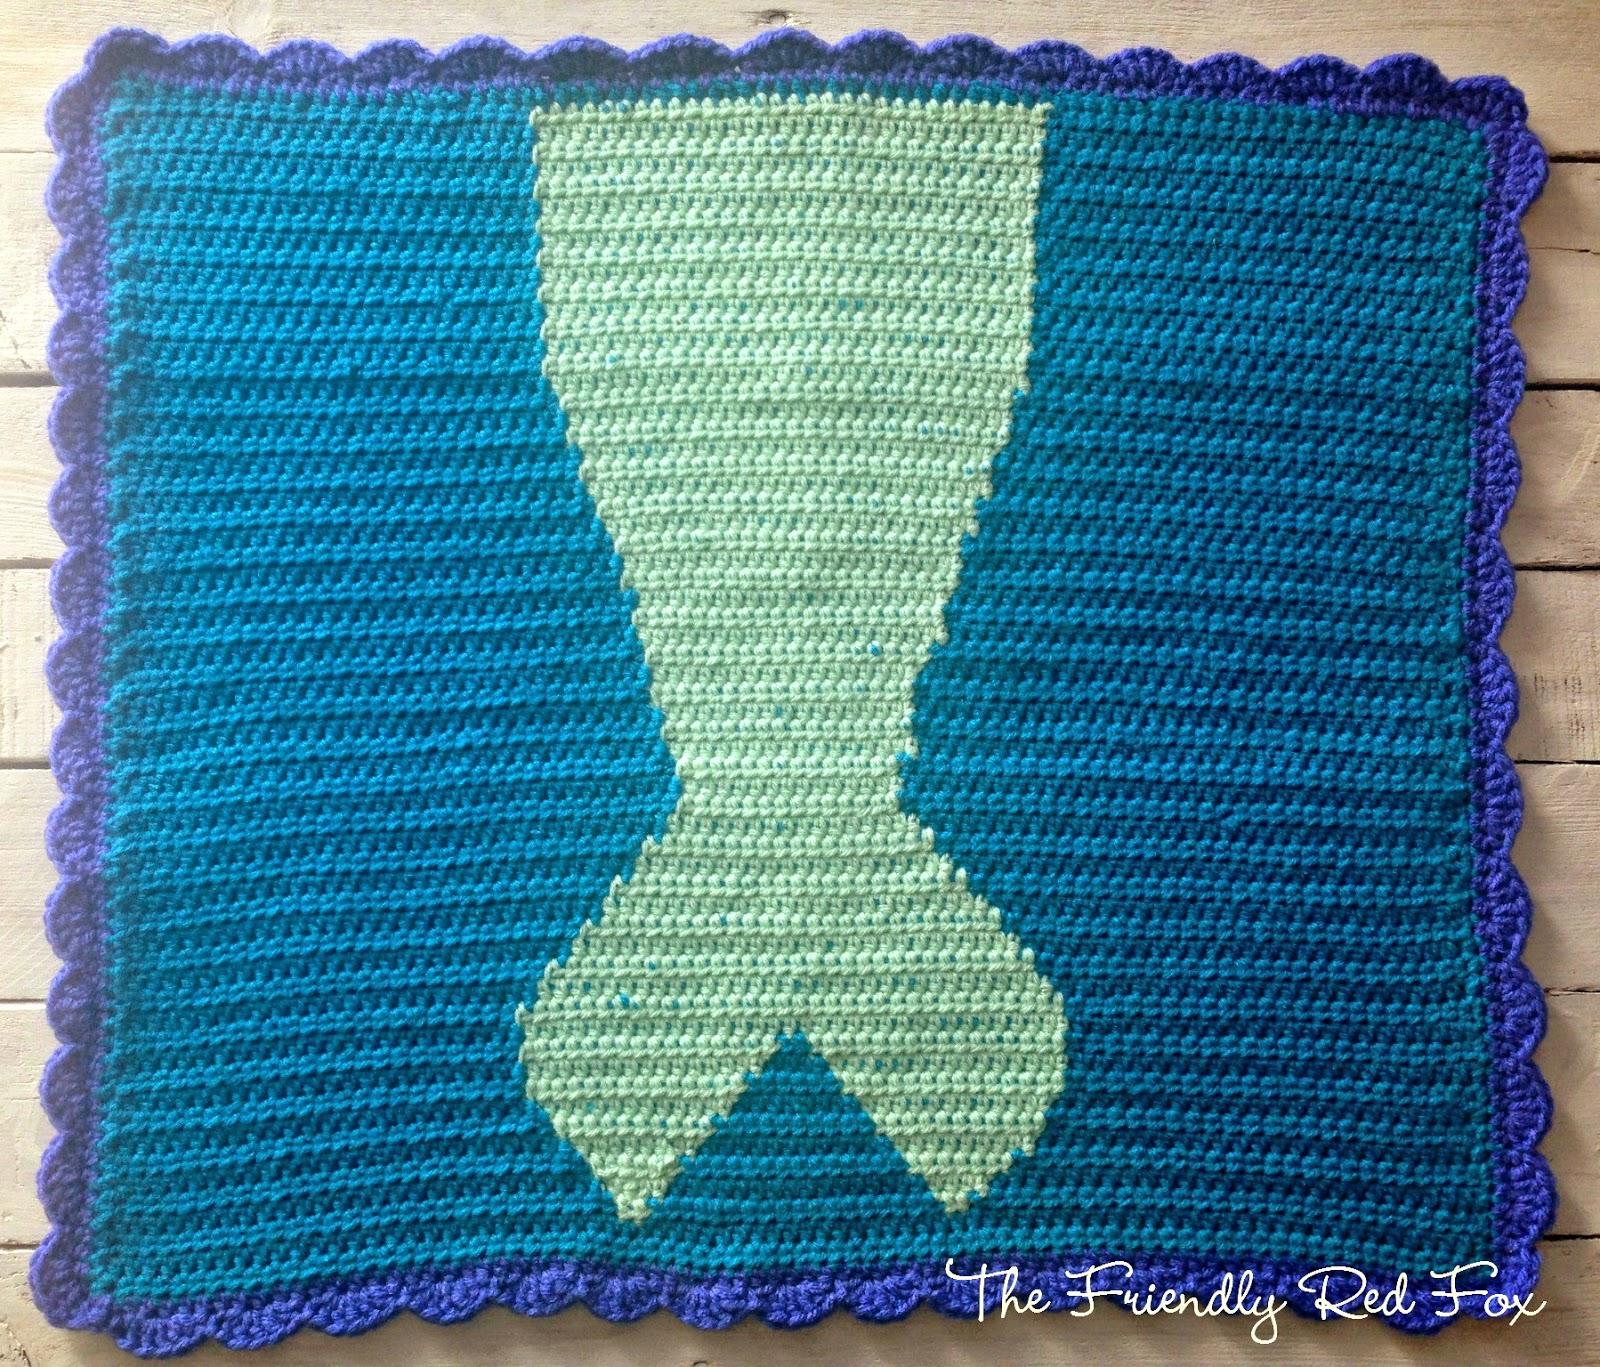 Free Crochet Mermaid Tail Blanket Pattern Thefriendlyredfox